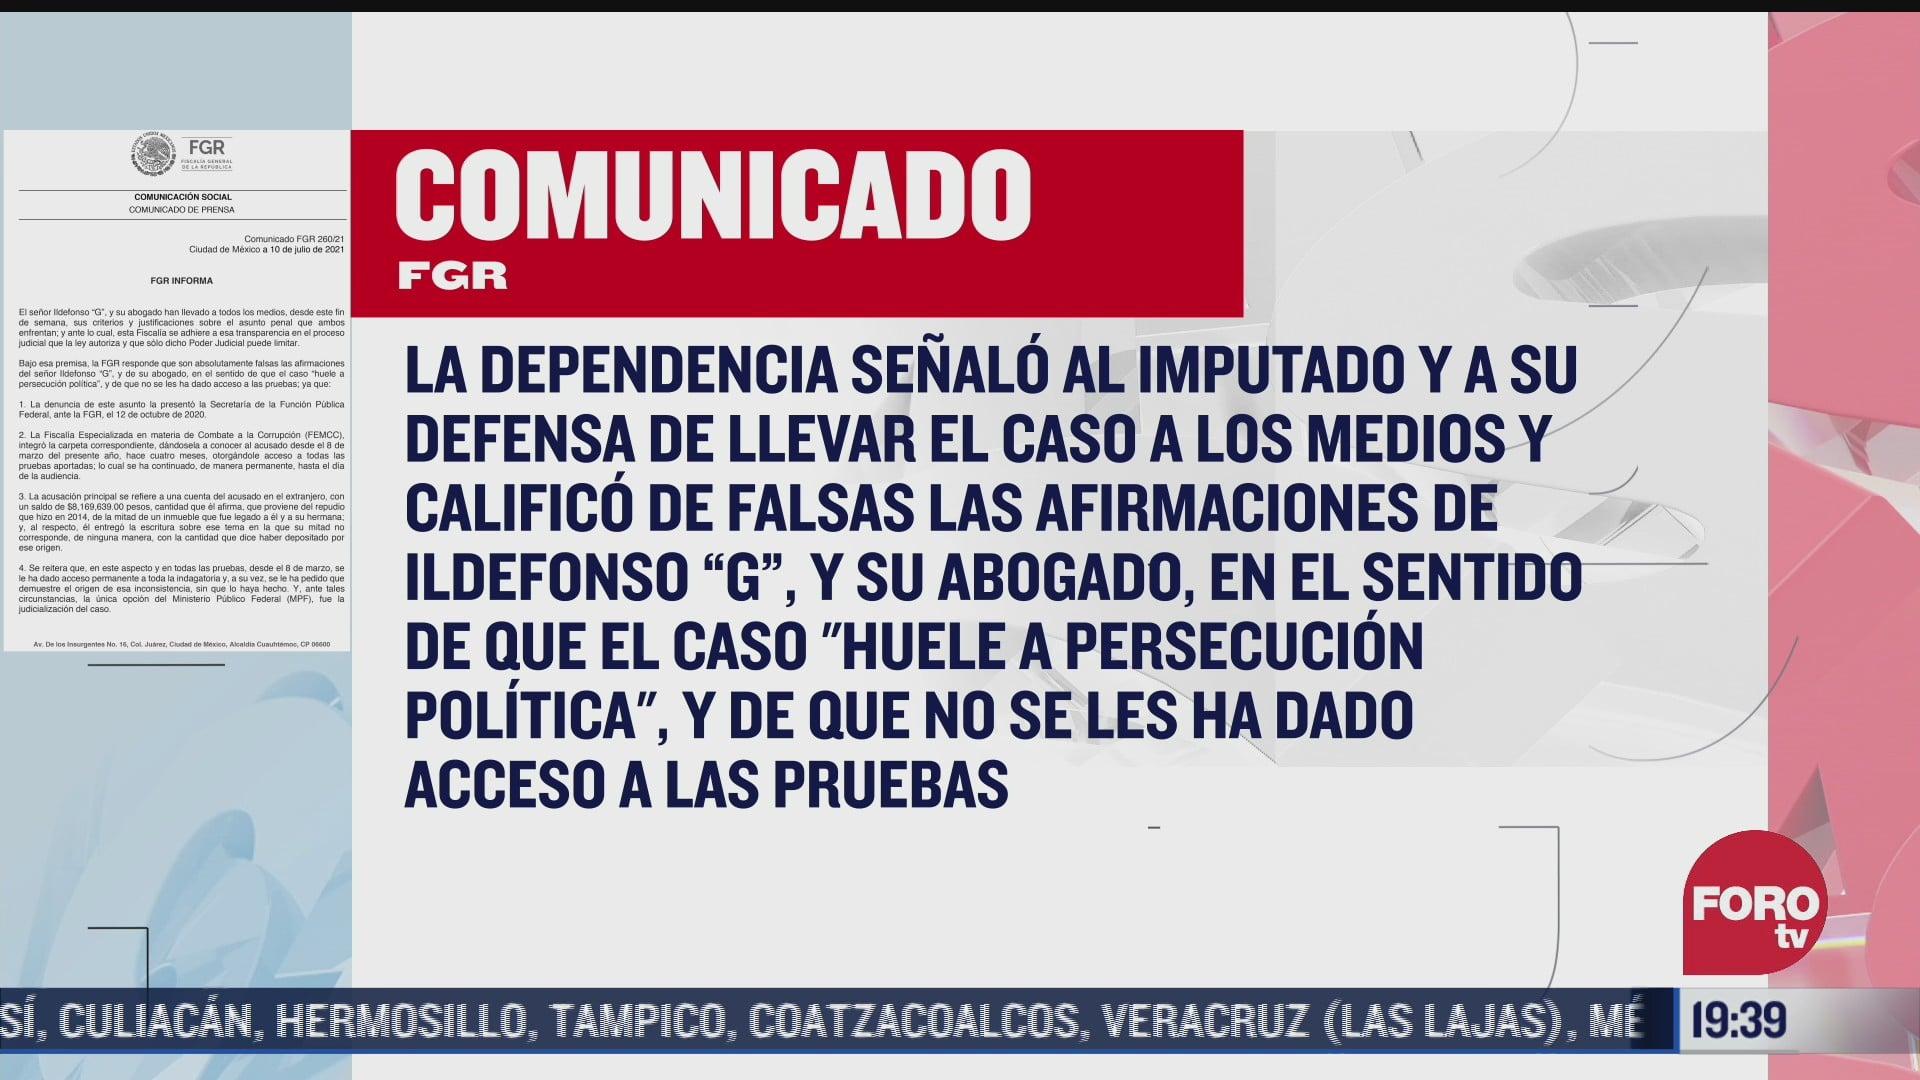 fgr detalla acusacion contra ildefonso guajardo